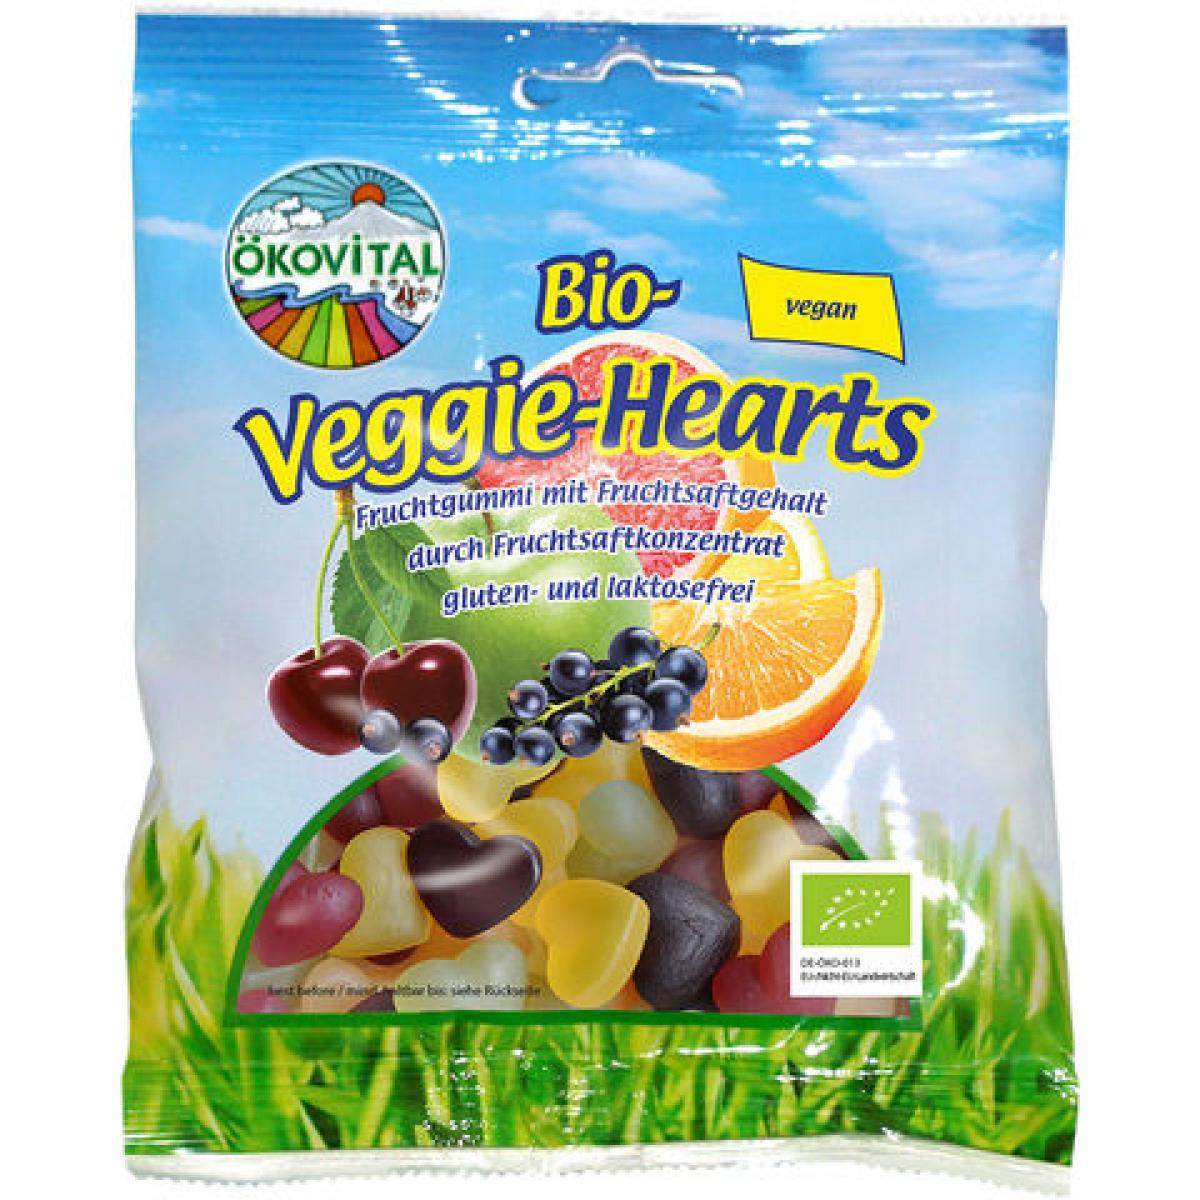 Želé srdiečka BIO vegan - 100 g